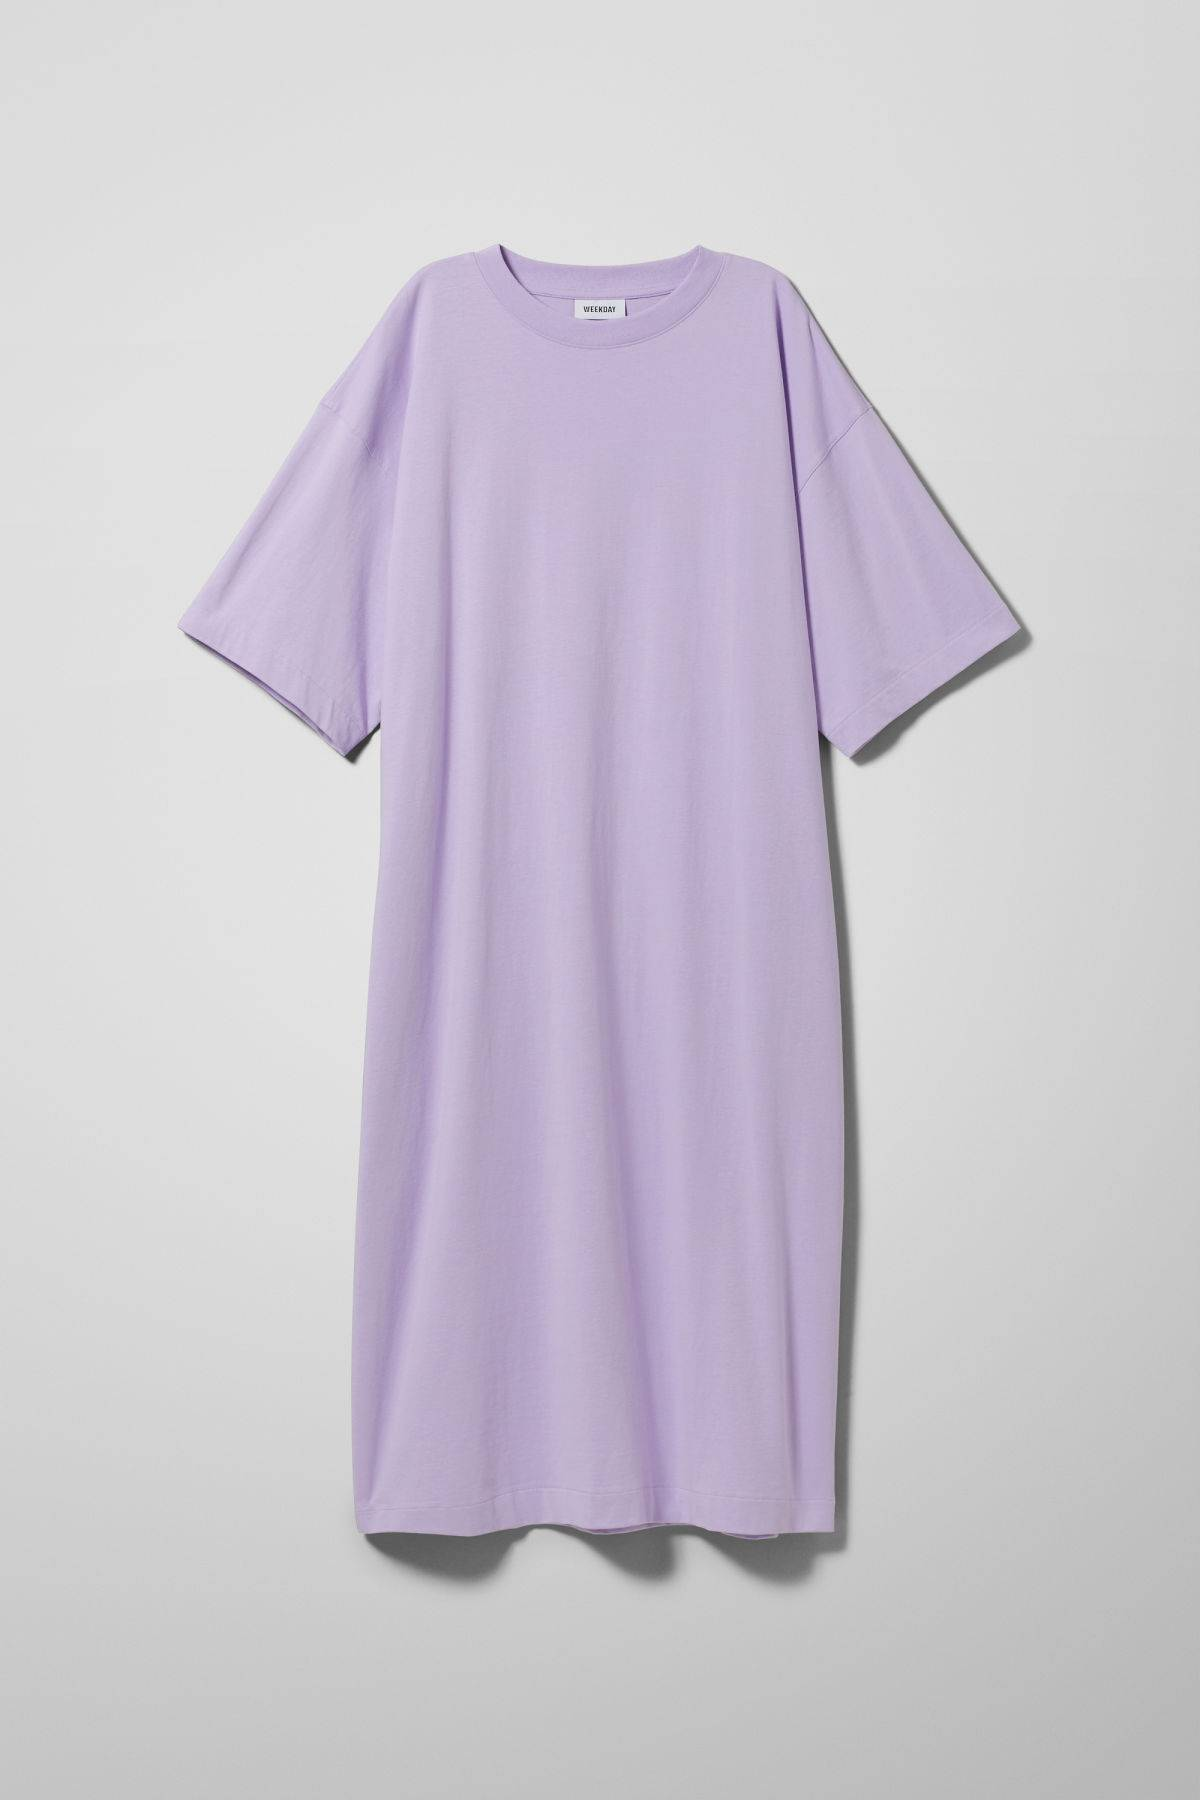 Image of Ines T-Shirt Dress - Purple-XS